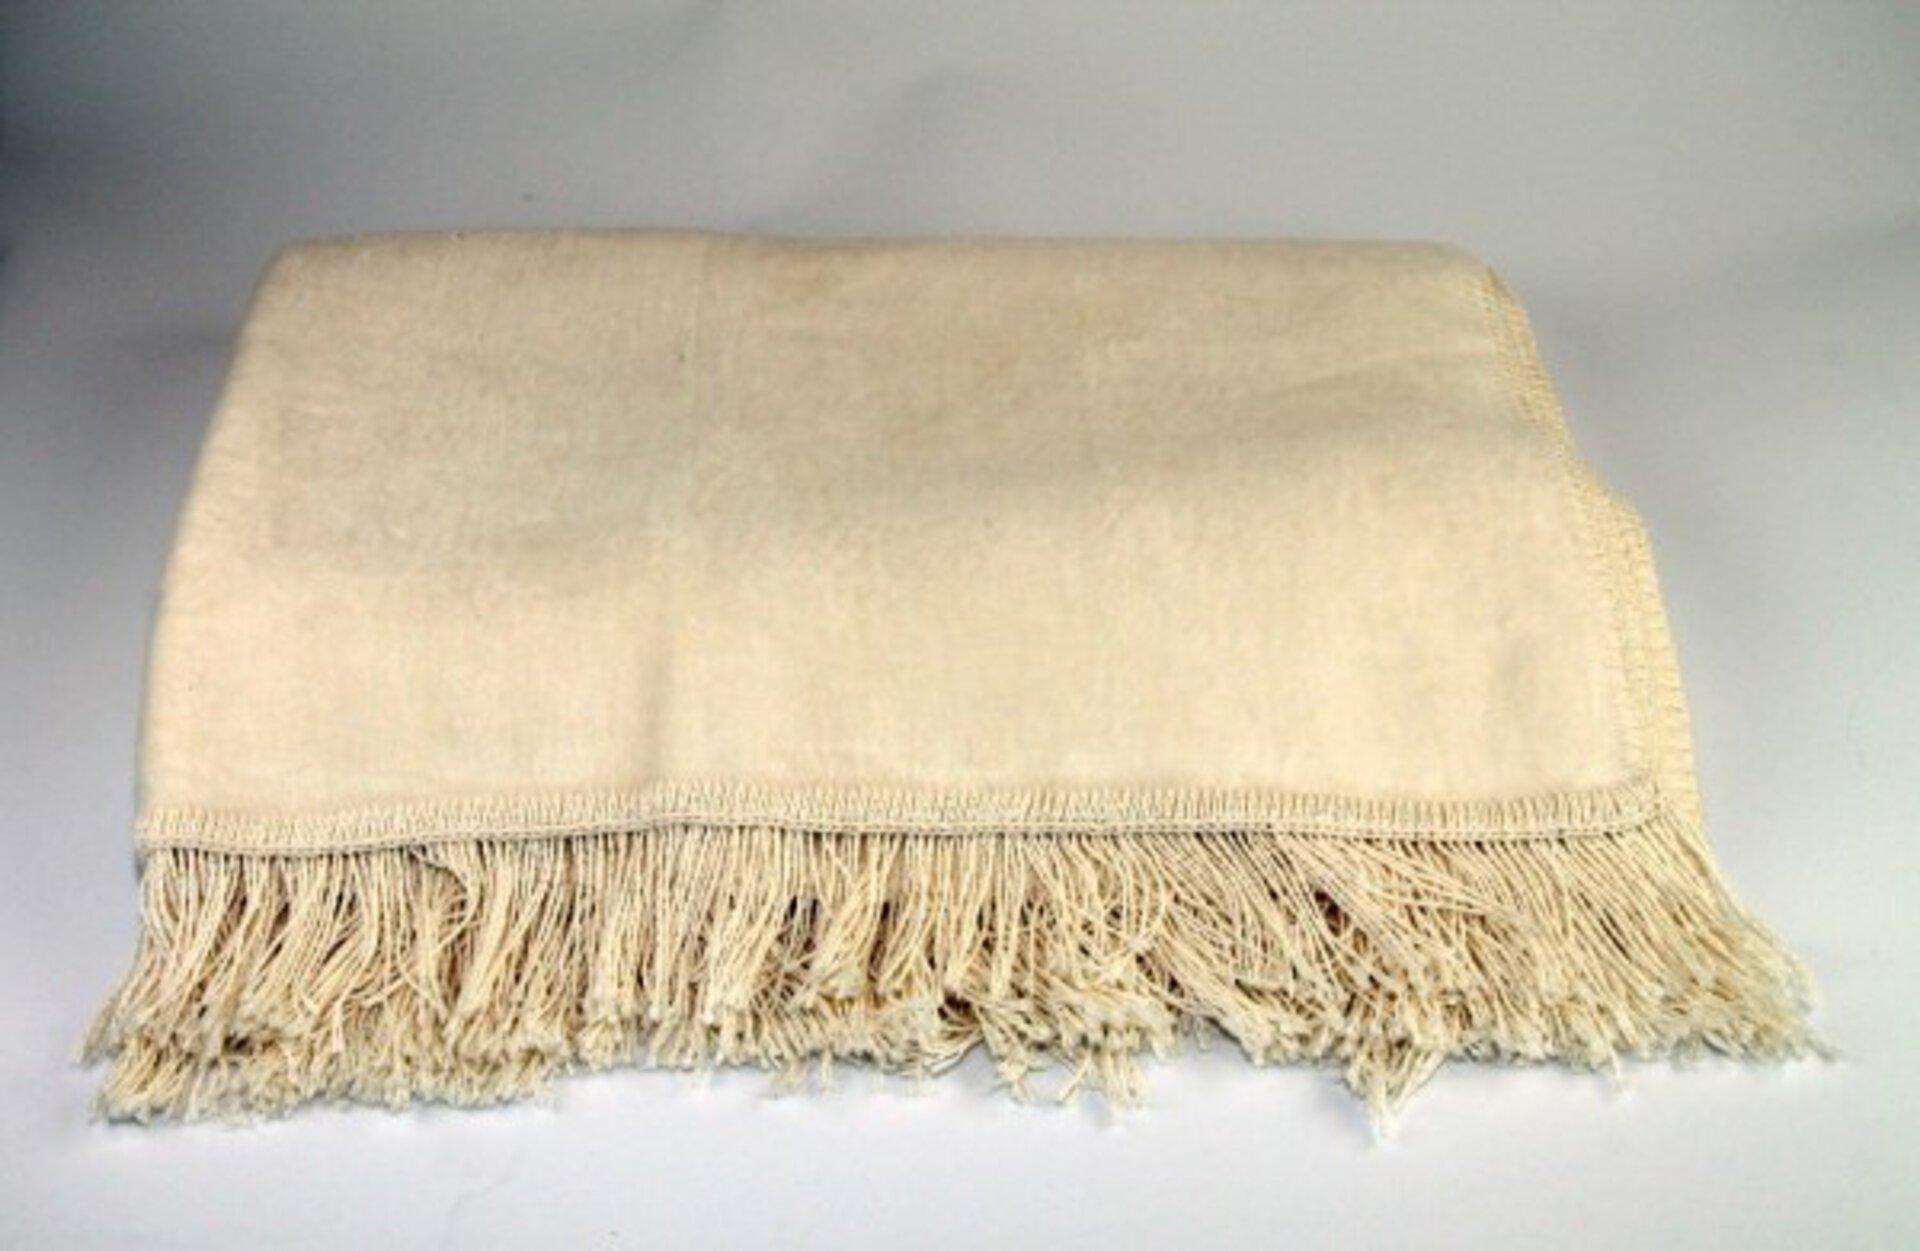 Sofaläufer Casa Nova Textil 100 x 200 cm